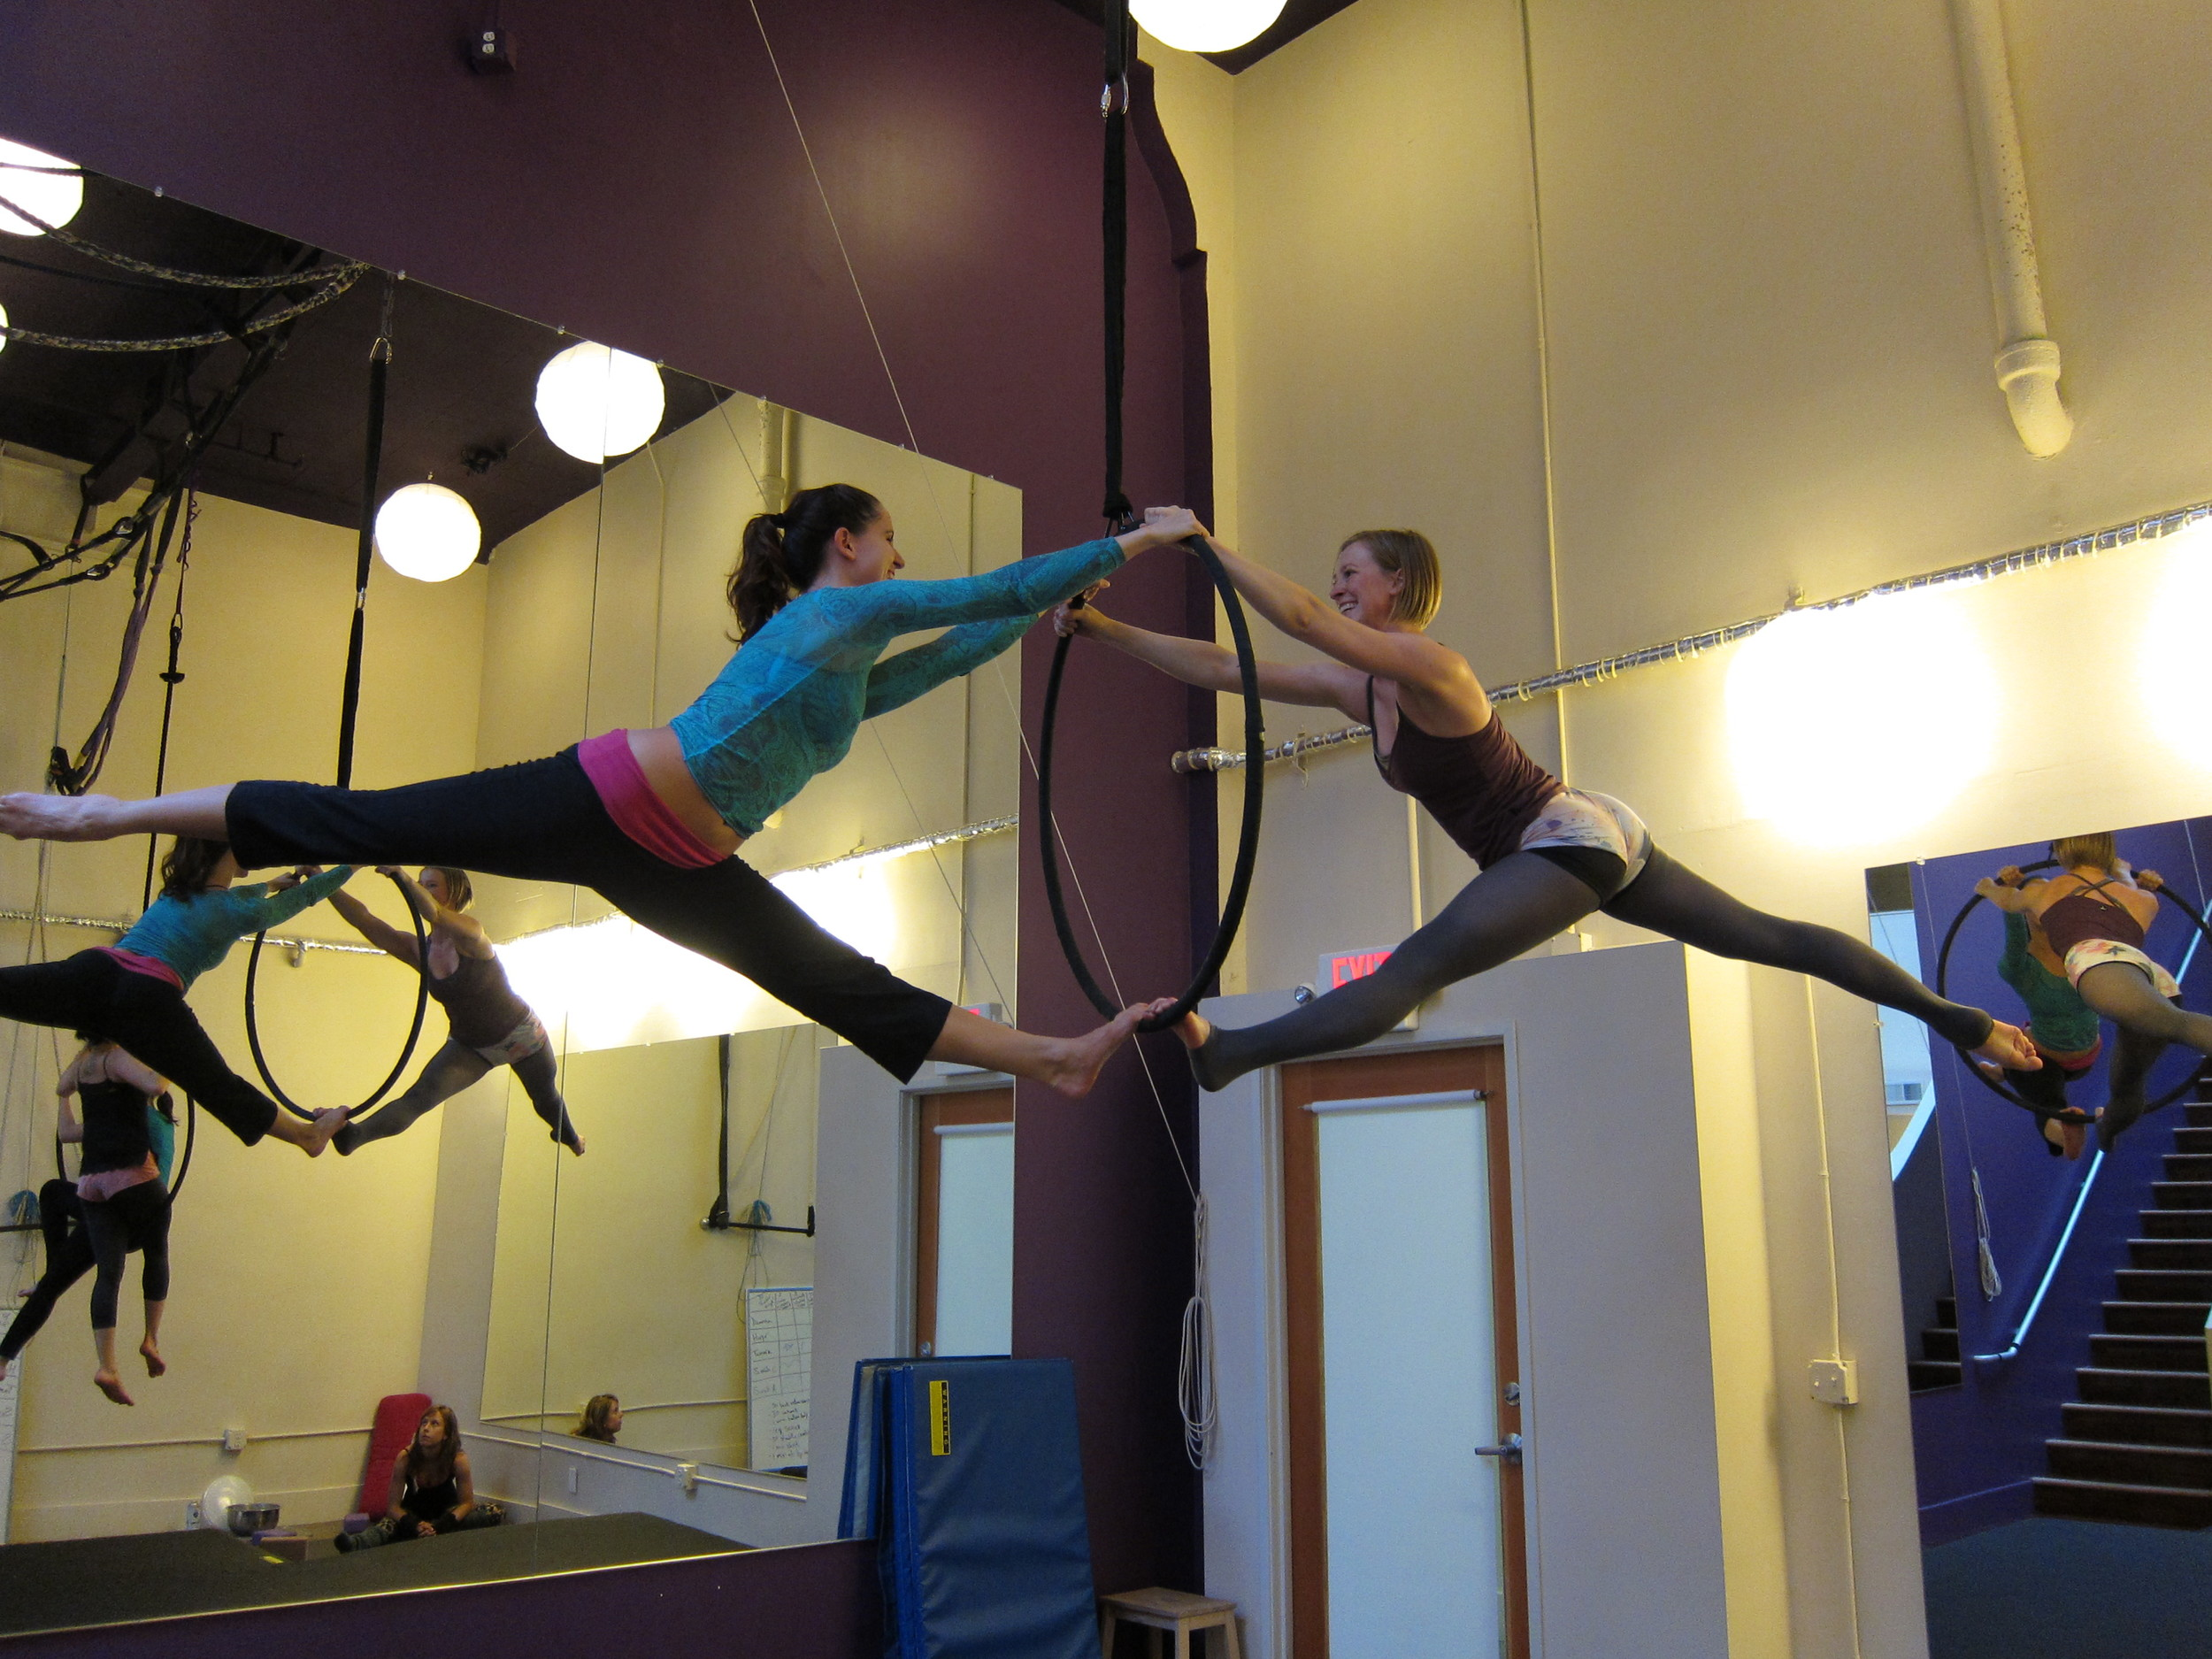 Tamara (l) and Sarah (r) practice chopsticks | Night Flight Aerial